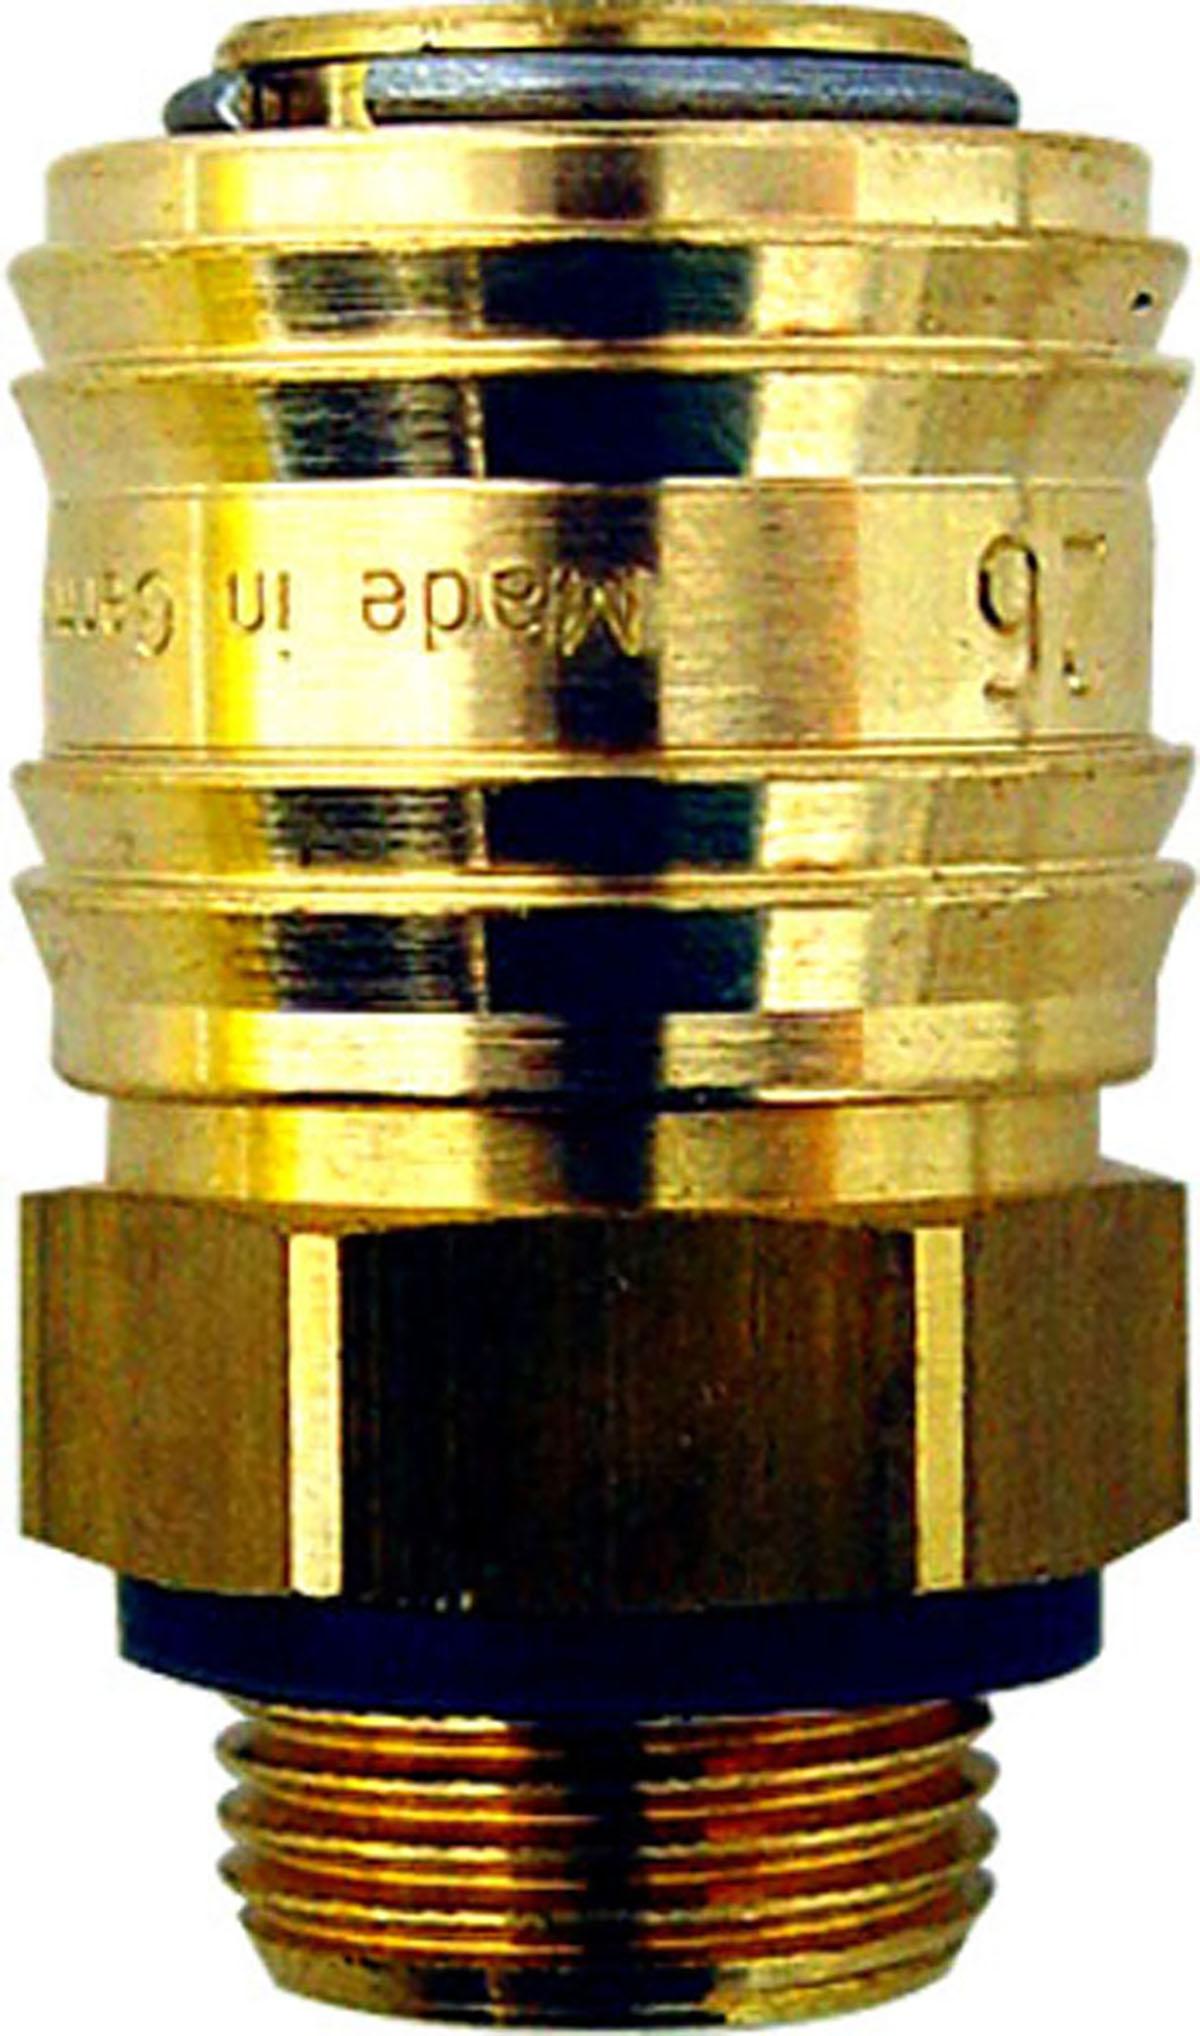 Z130.31E Kupplung